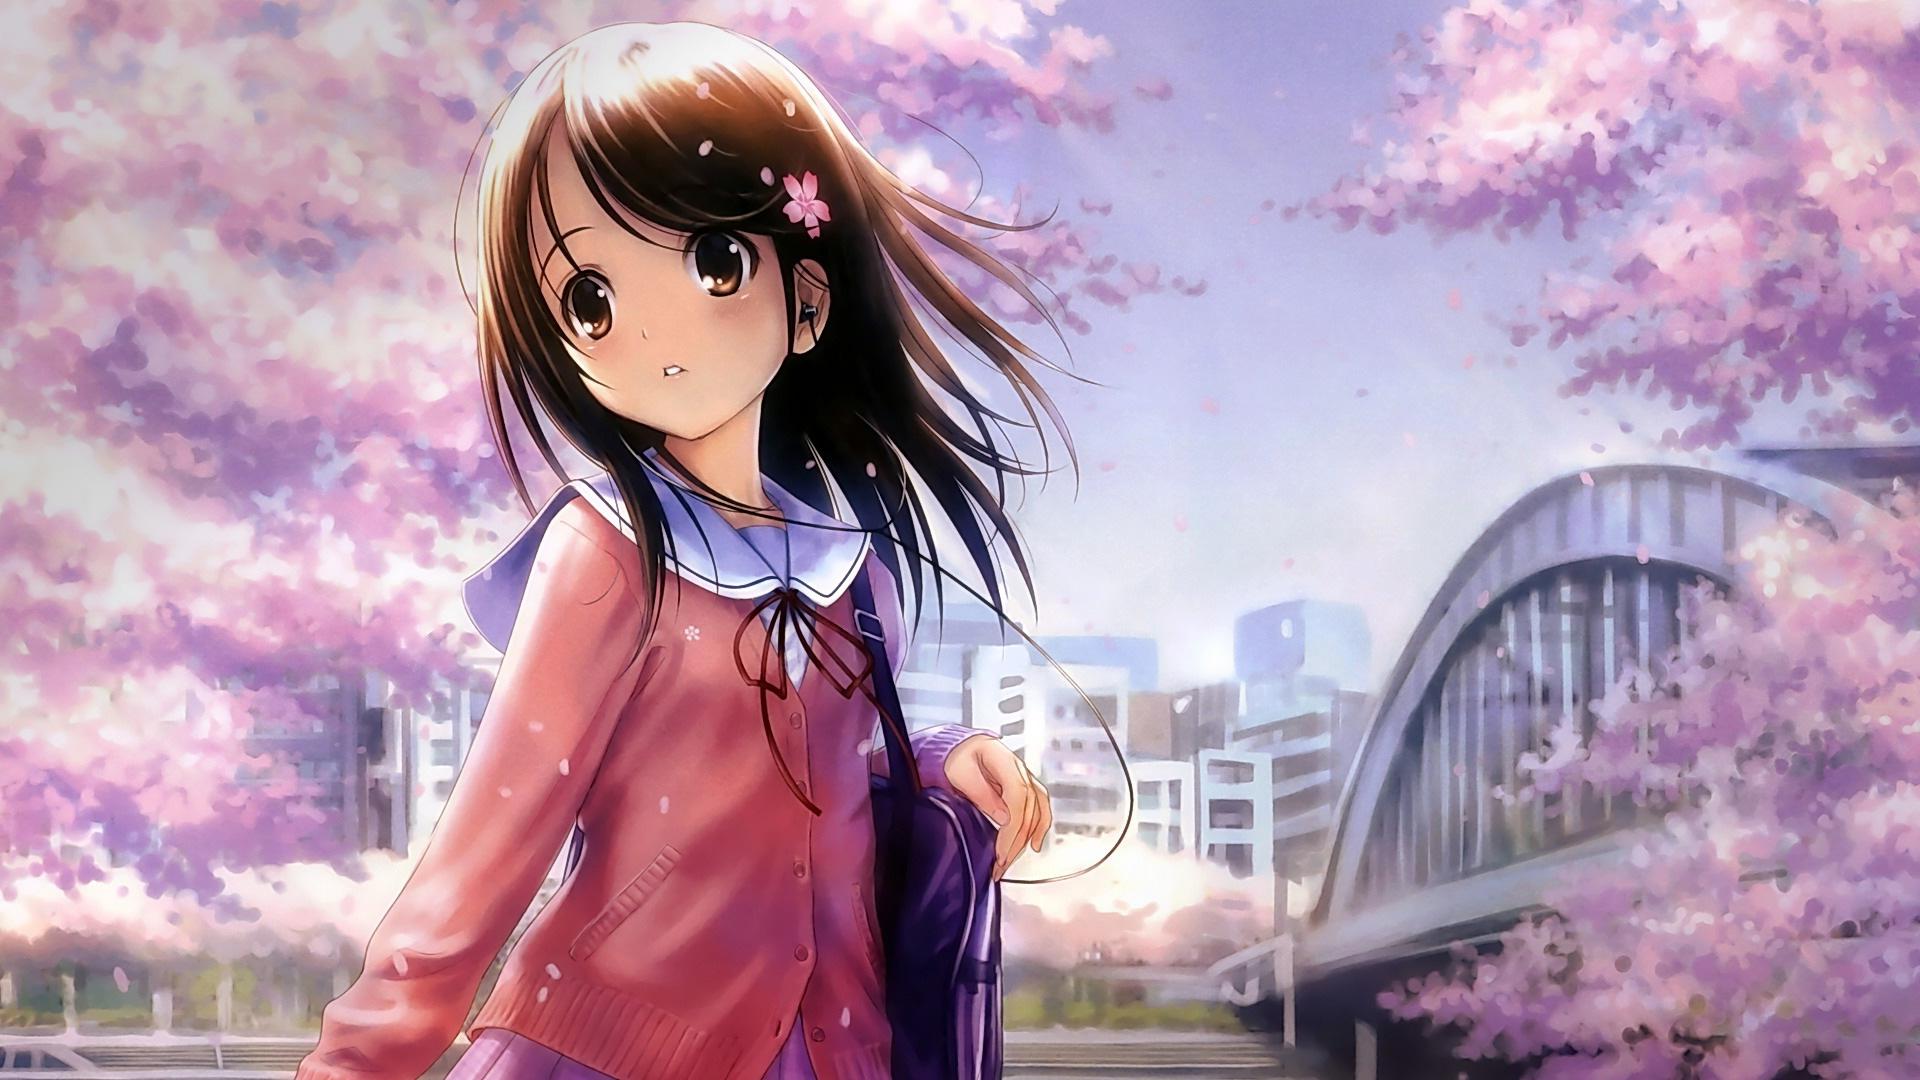 Calendar Girl Wallpaper Hd : Anime girl hd wallpaper p wallpapersafari